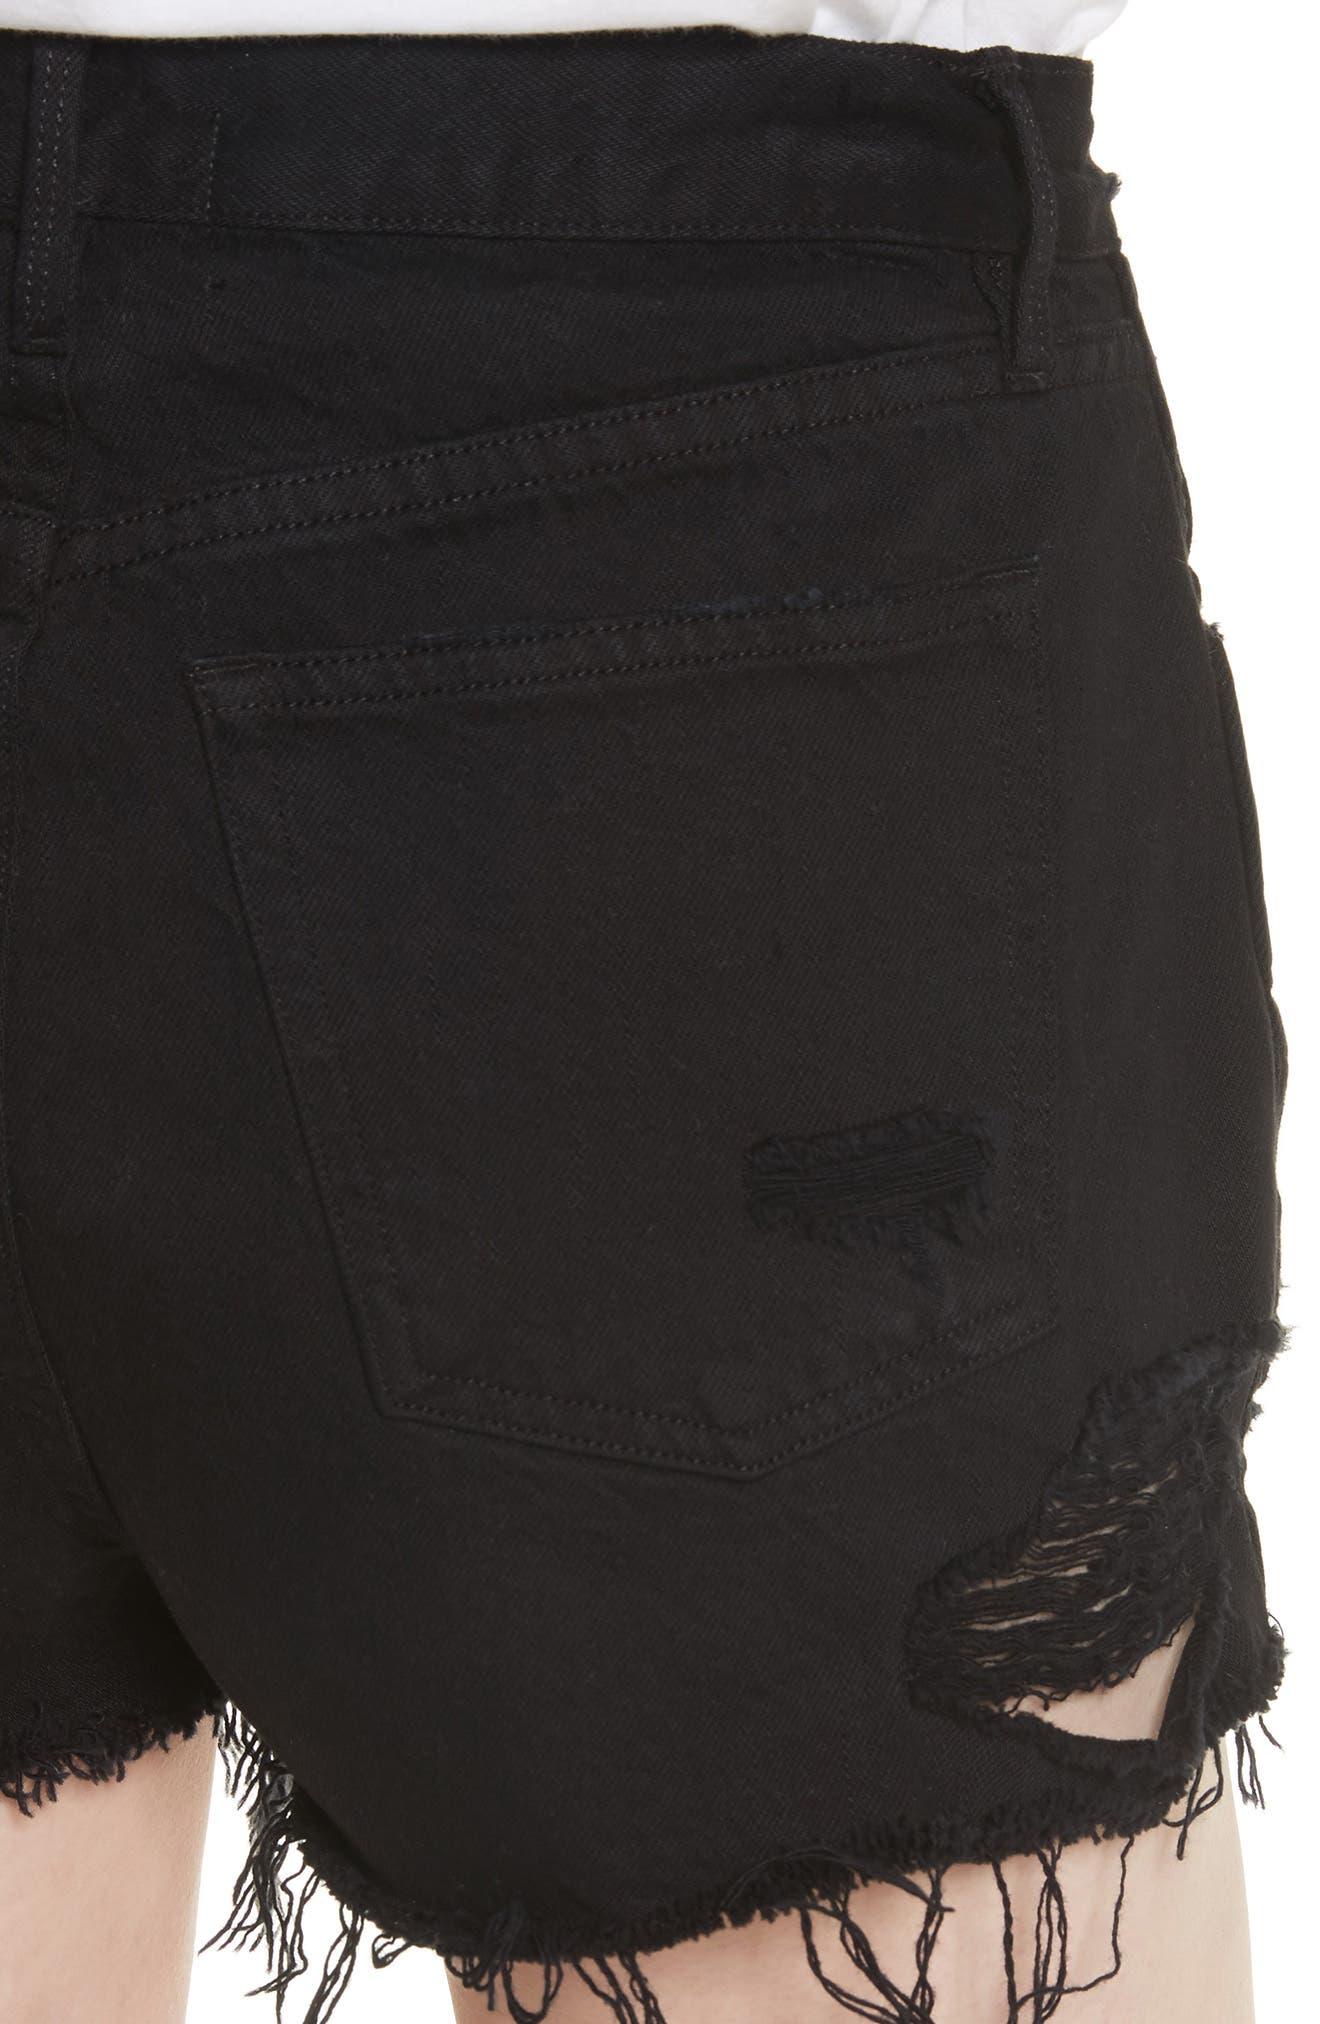 W4 Carter Ripped High Waist Denim Shorts,                             Alternate thumbnail 4, color,                             002